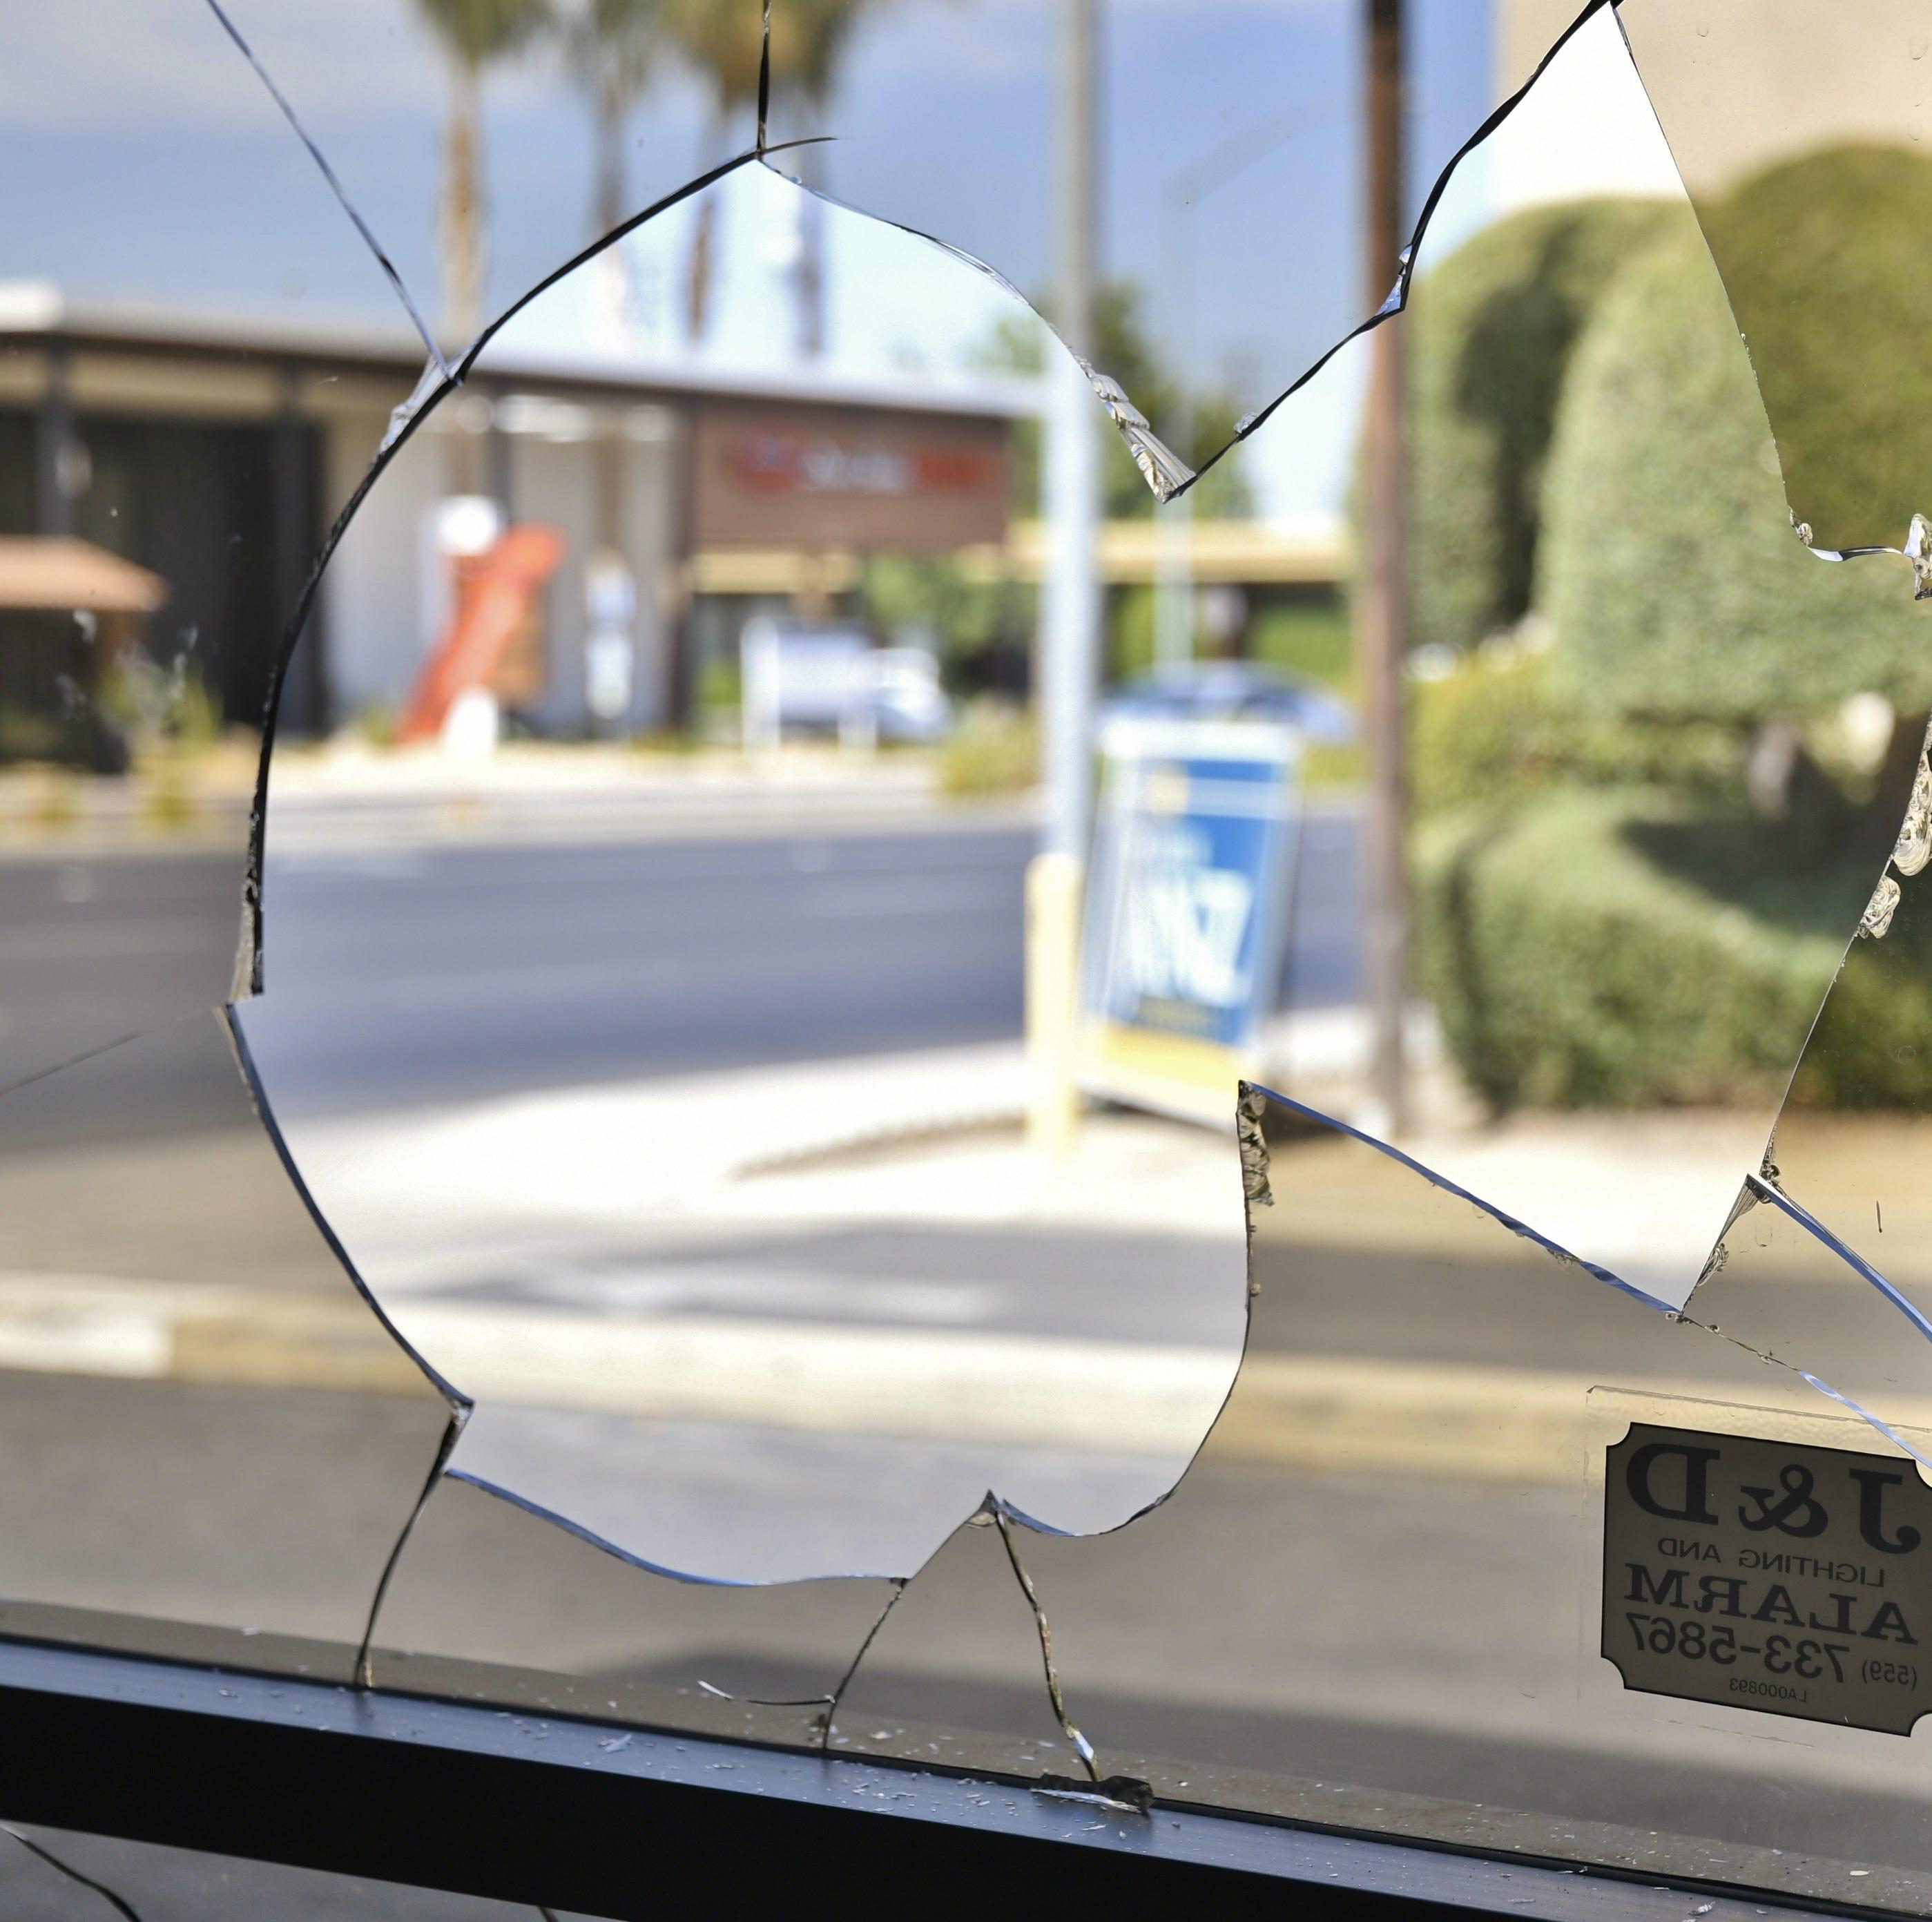 Andrew Janz 'won't back down' after Visalia headquarters vandalized